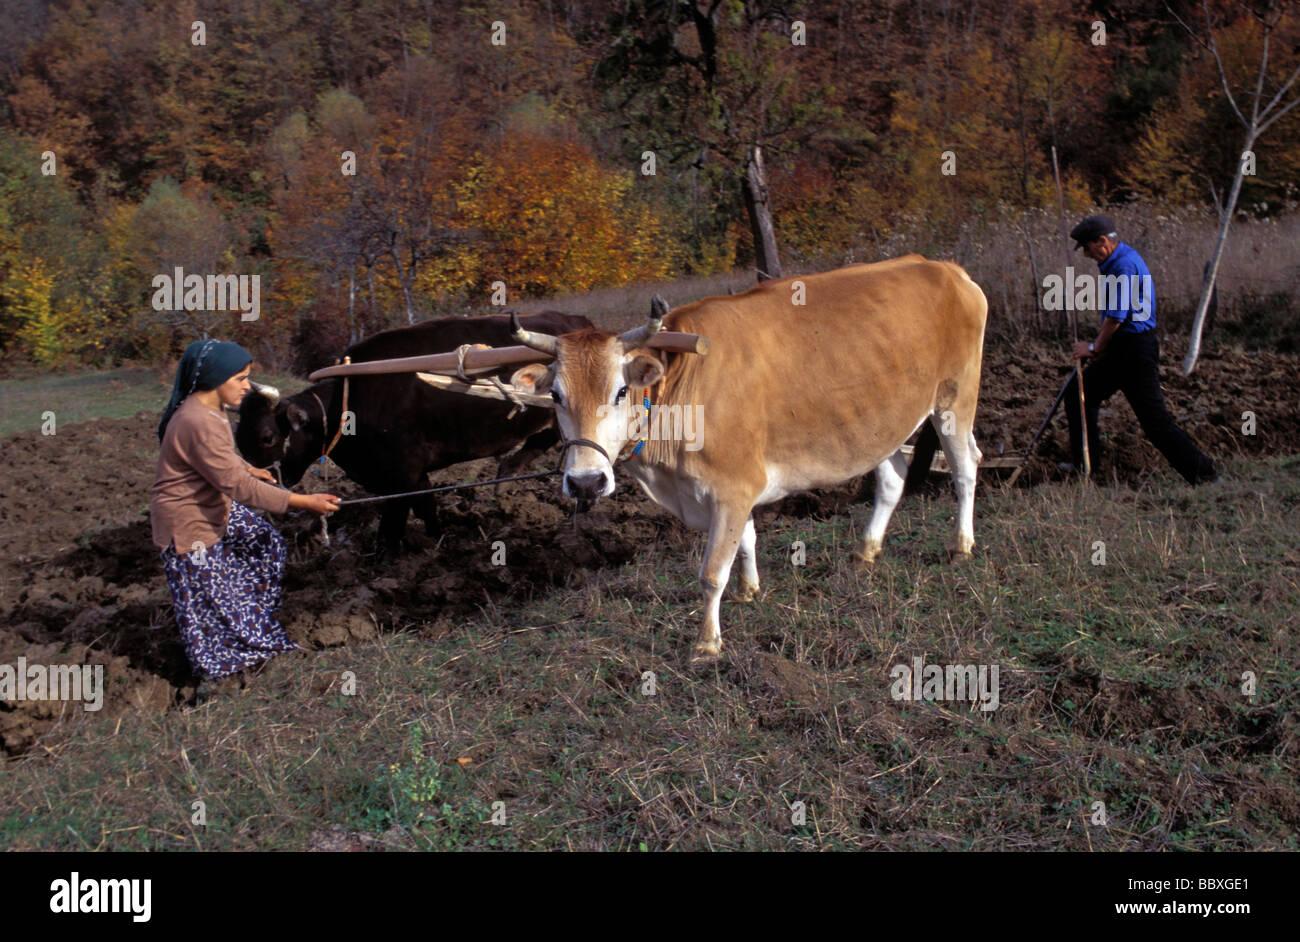 Farmer family plowing with oxes Sakarya Turkey - Stock Image